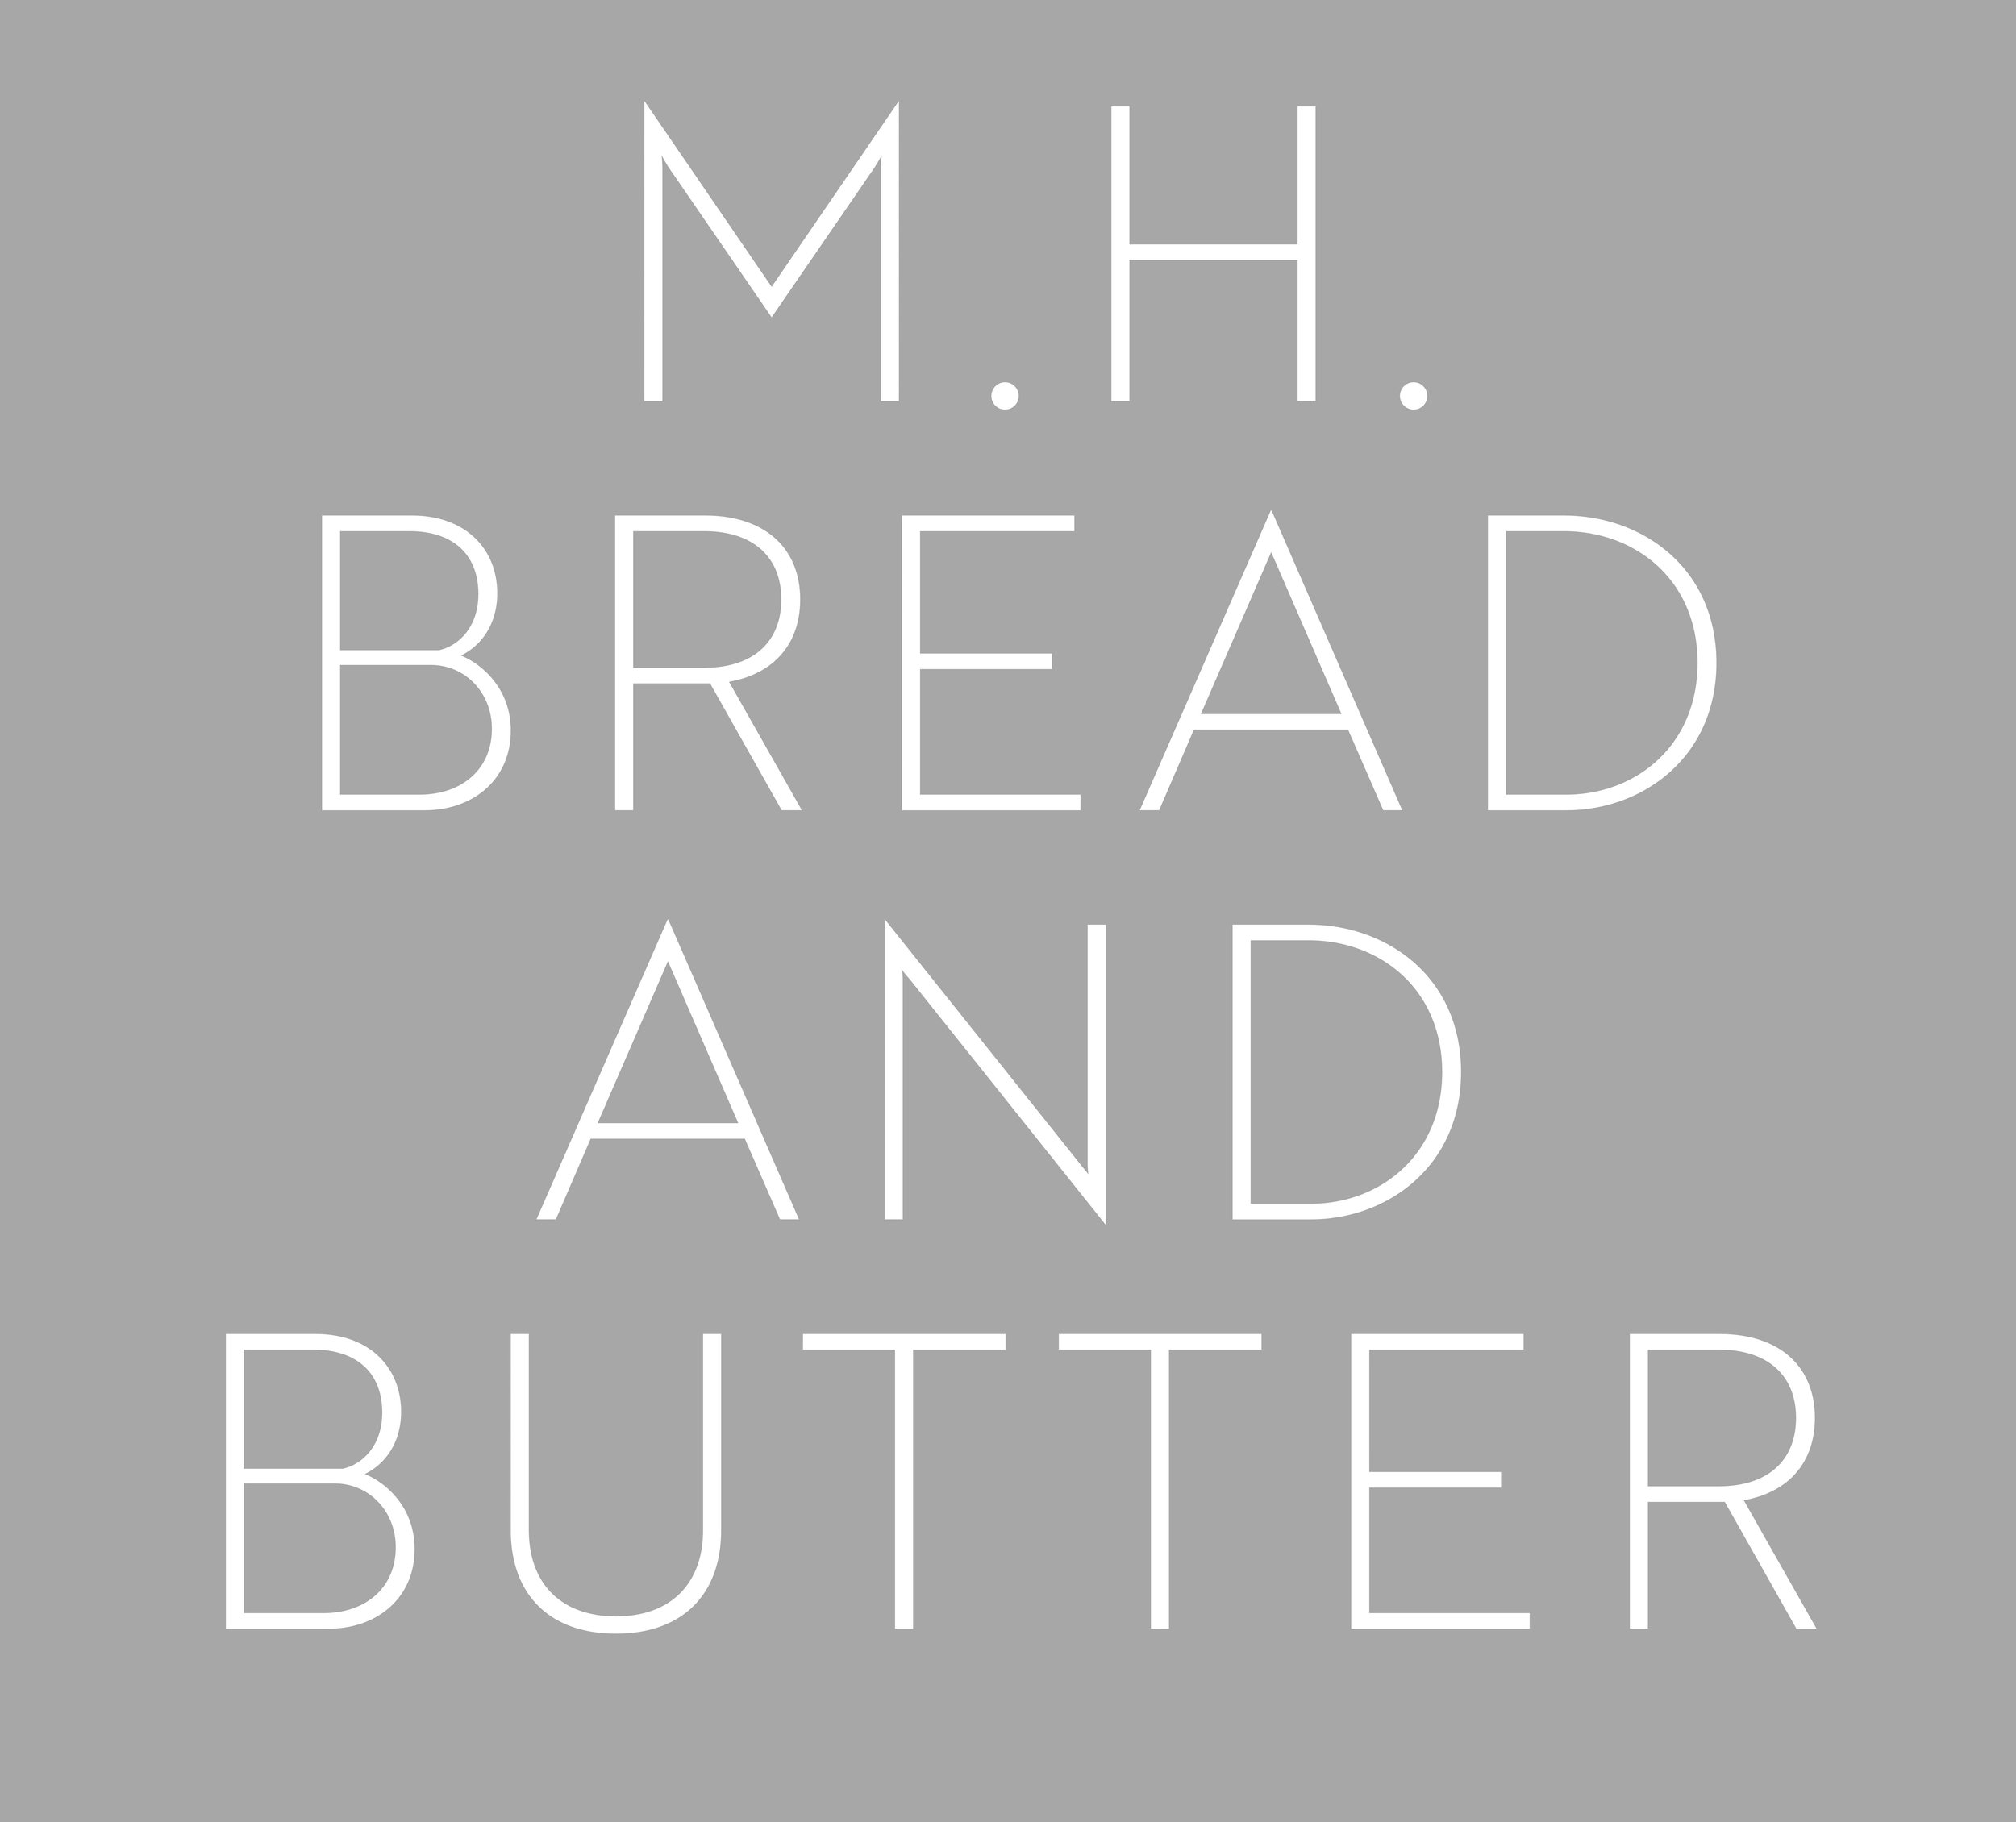 mhbb biz name sign.jpg